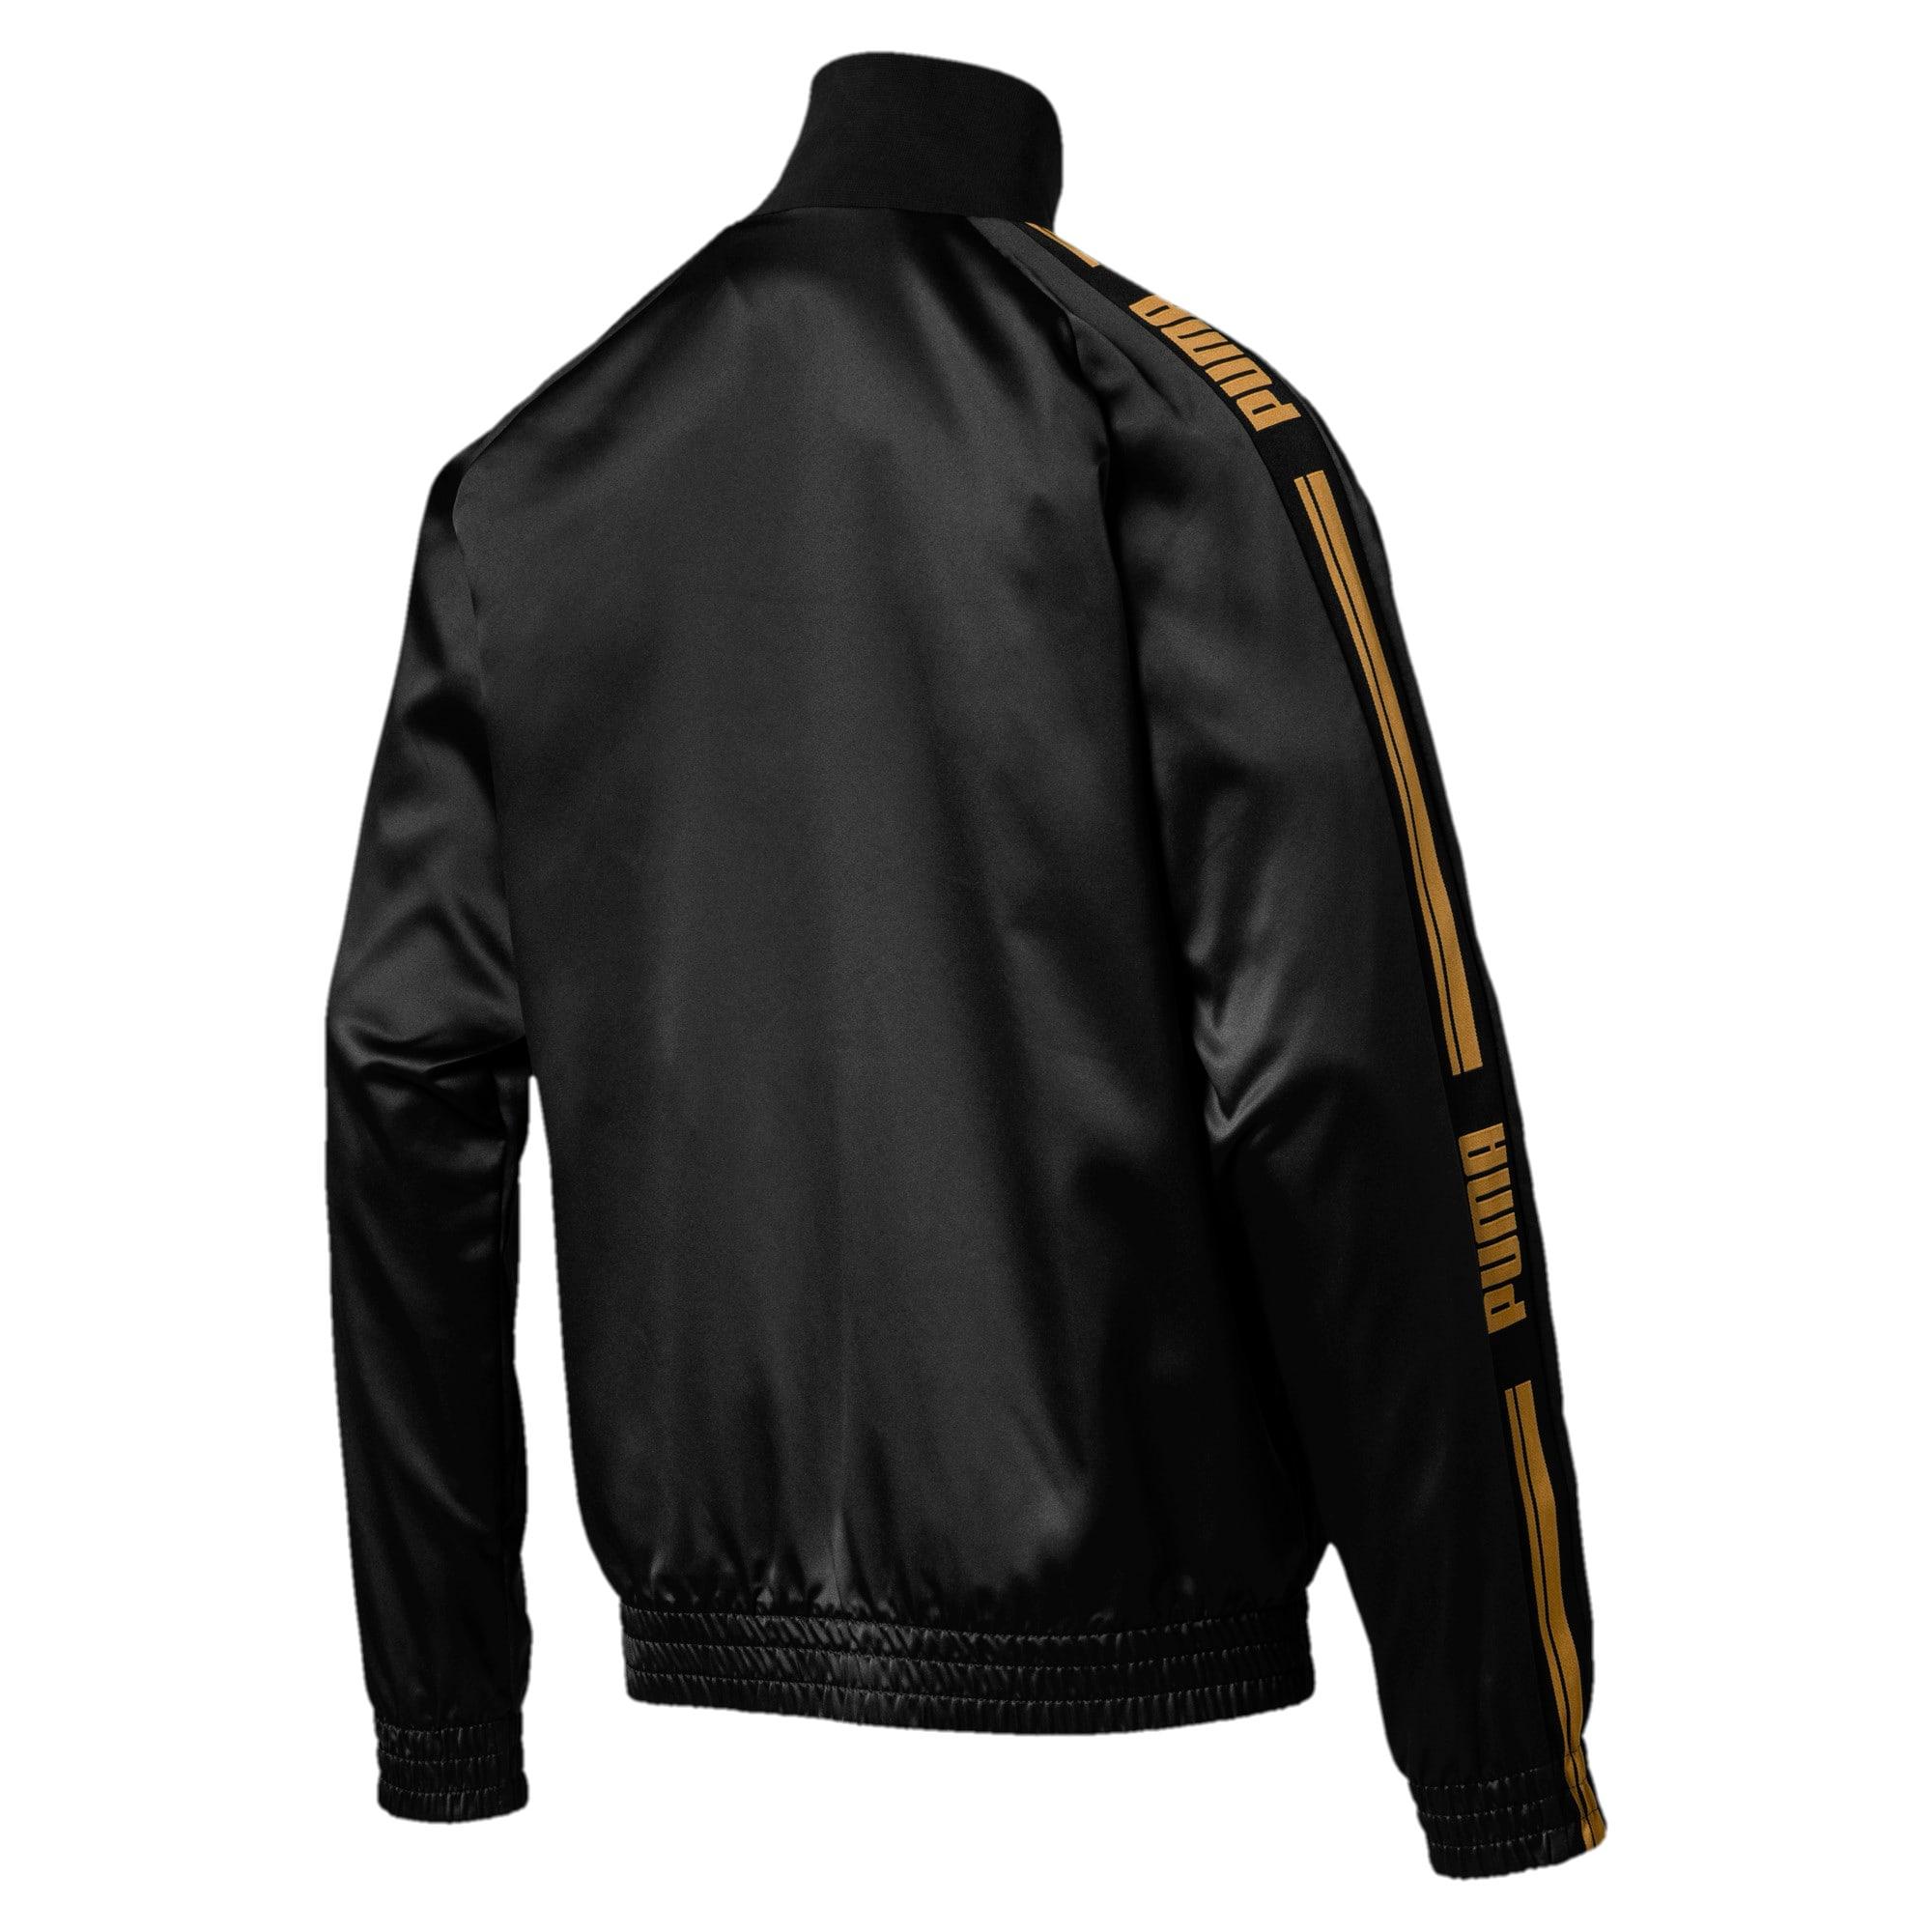 Thumbnail 4 of LUXE PACK Track Jacket, Puma Black, medium